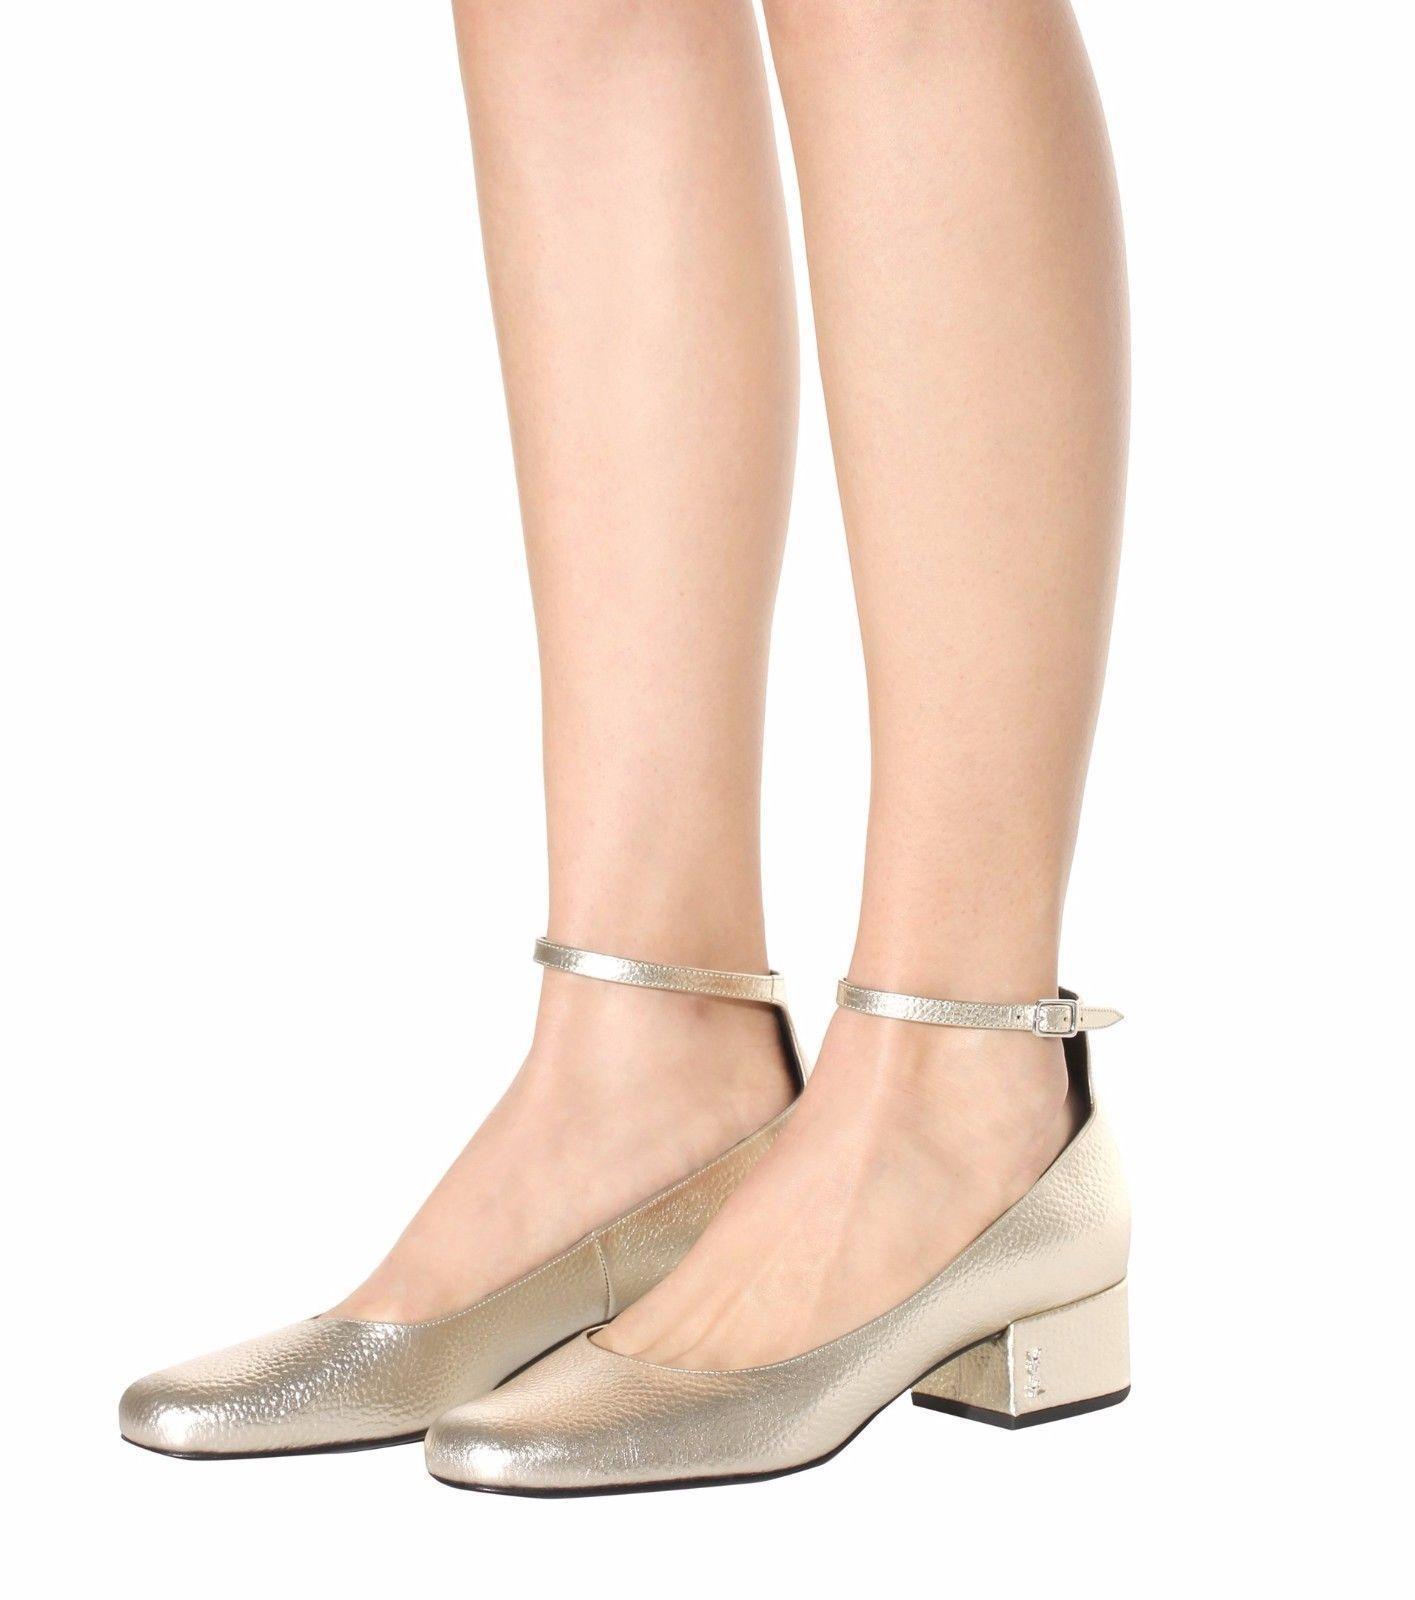 2d873d1360b5 Ysl Saint Laurent Pump Tango Babies Ankle Strap Shoe Logo Low Heel Metallic  37.5